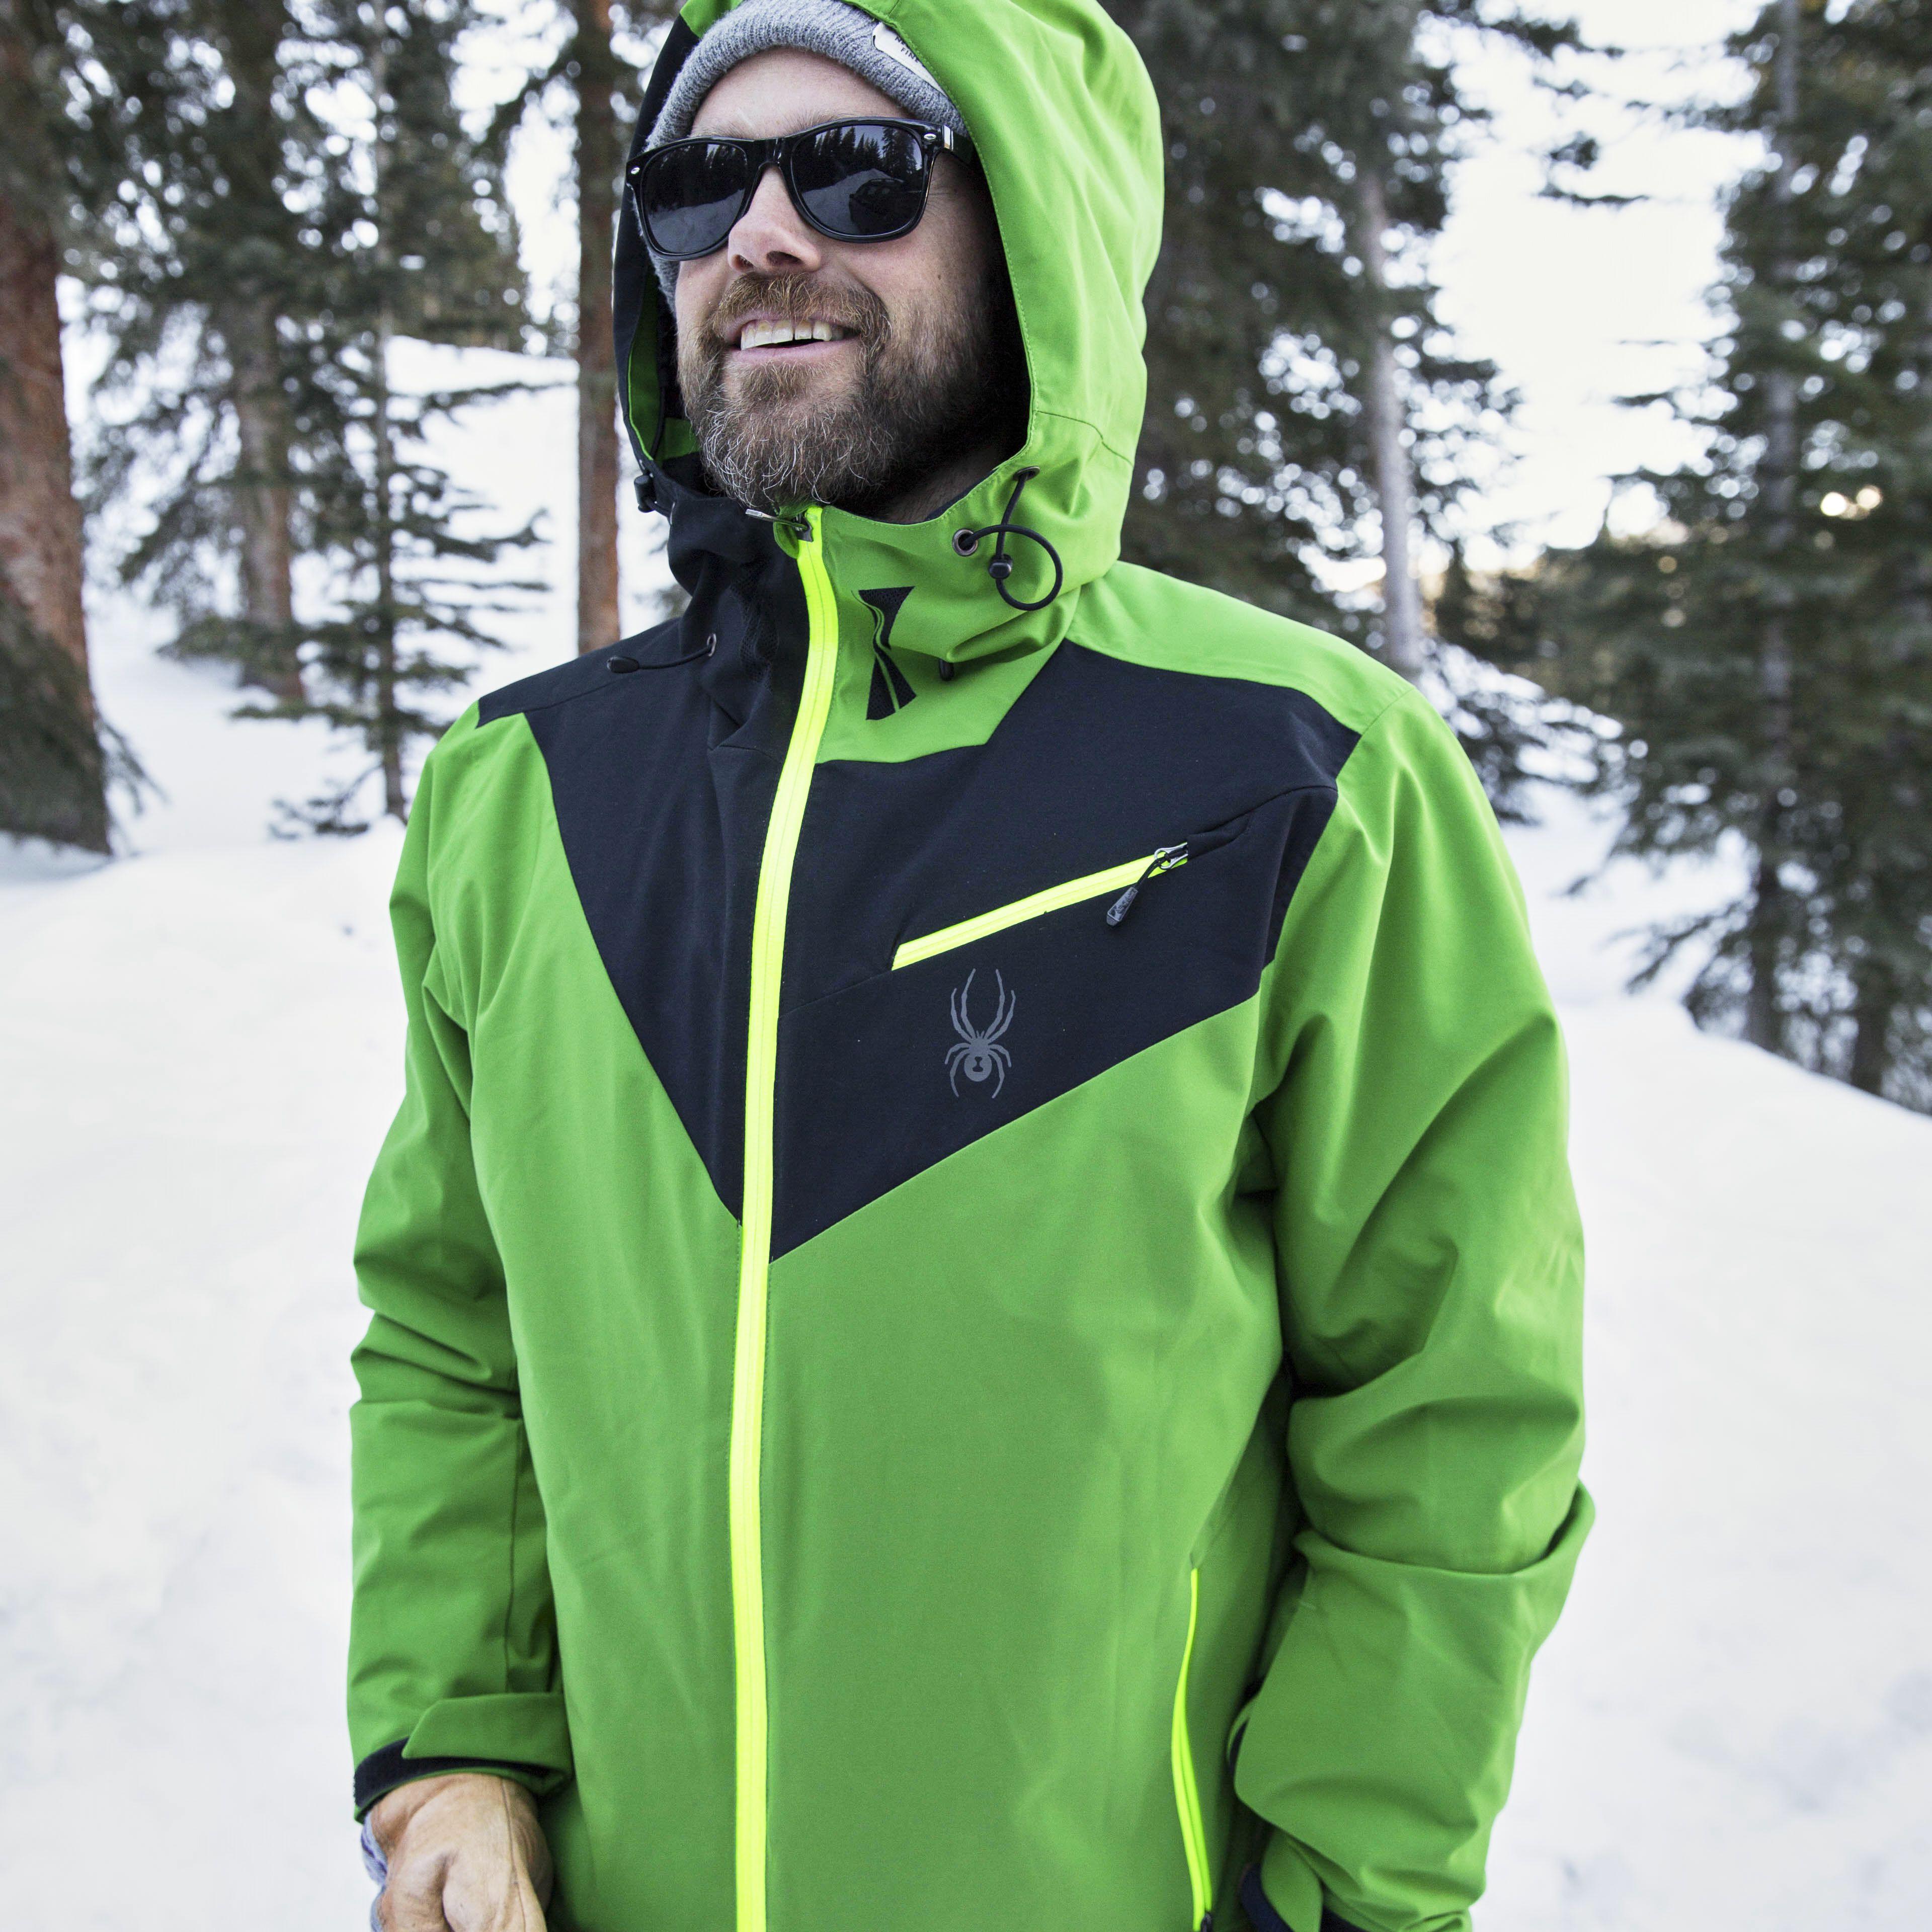 61124ea5a The 7 Best Men's Ski Jackets of 2019